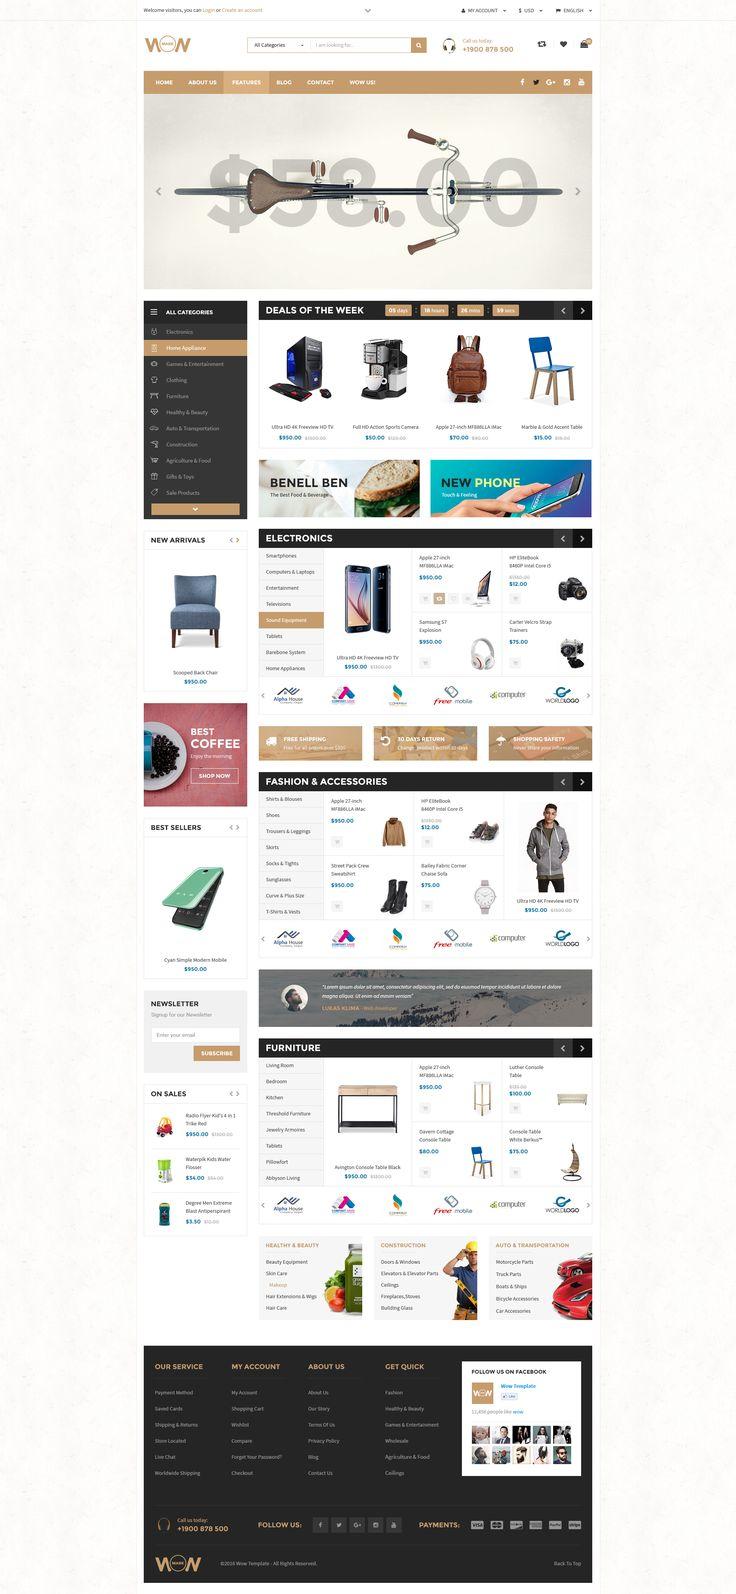 WOW - Multi-purpose E-commerce Template Marketplace Index 03